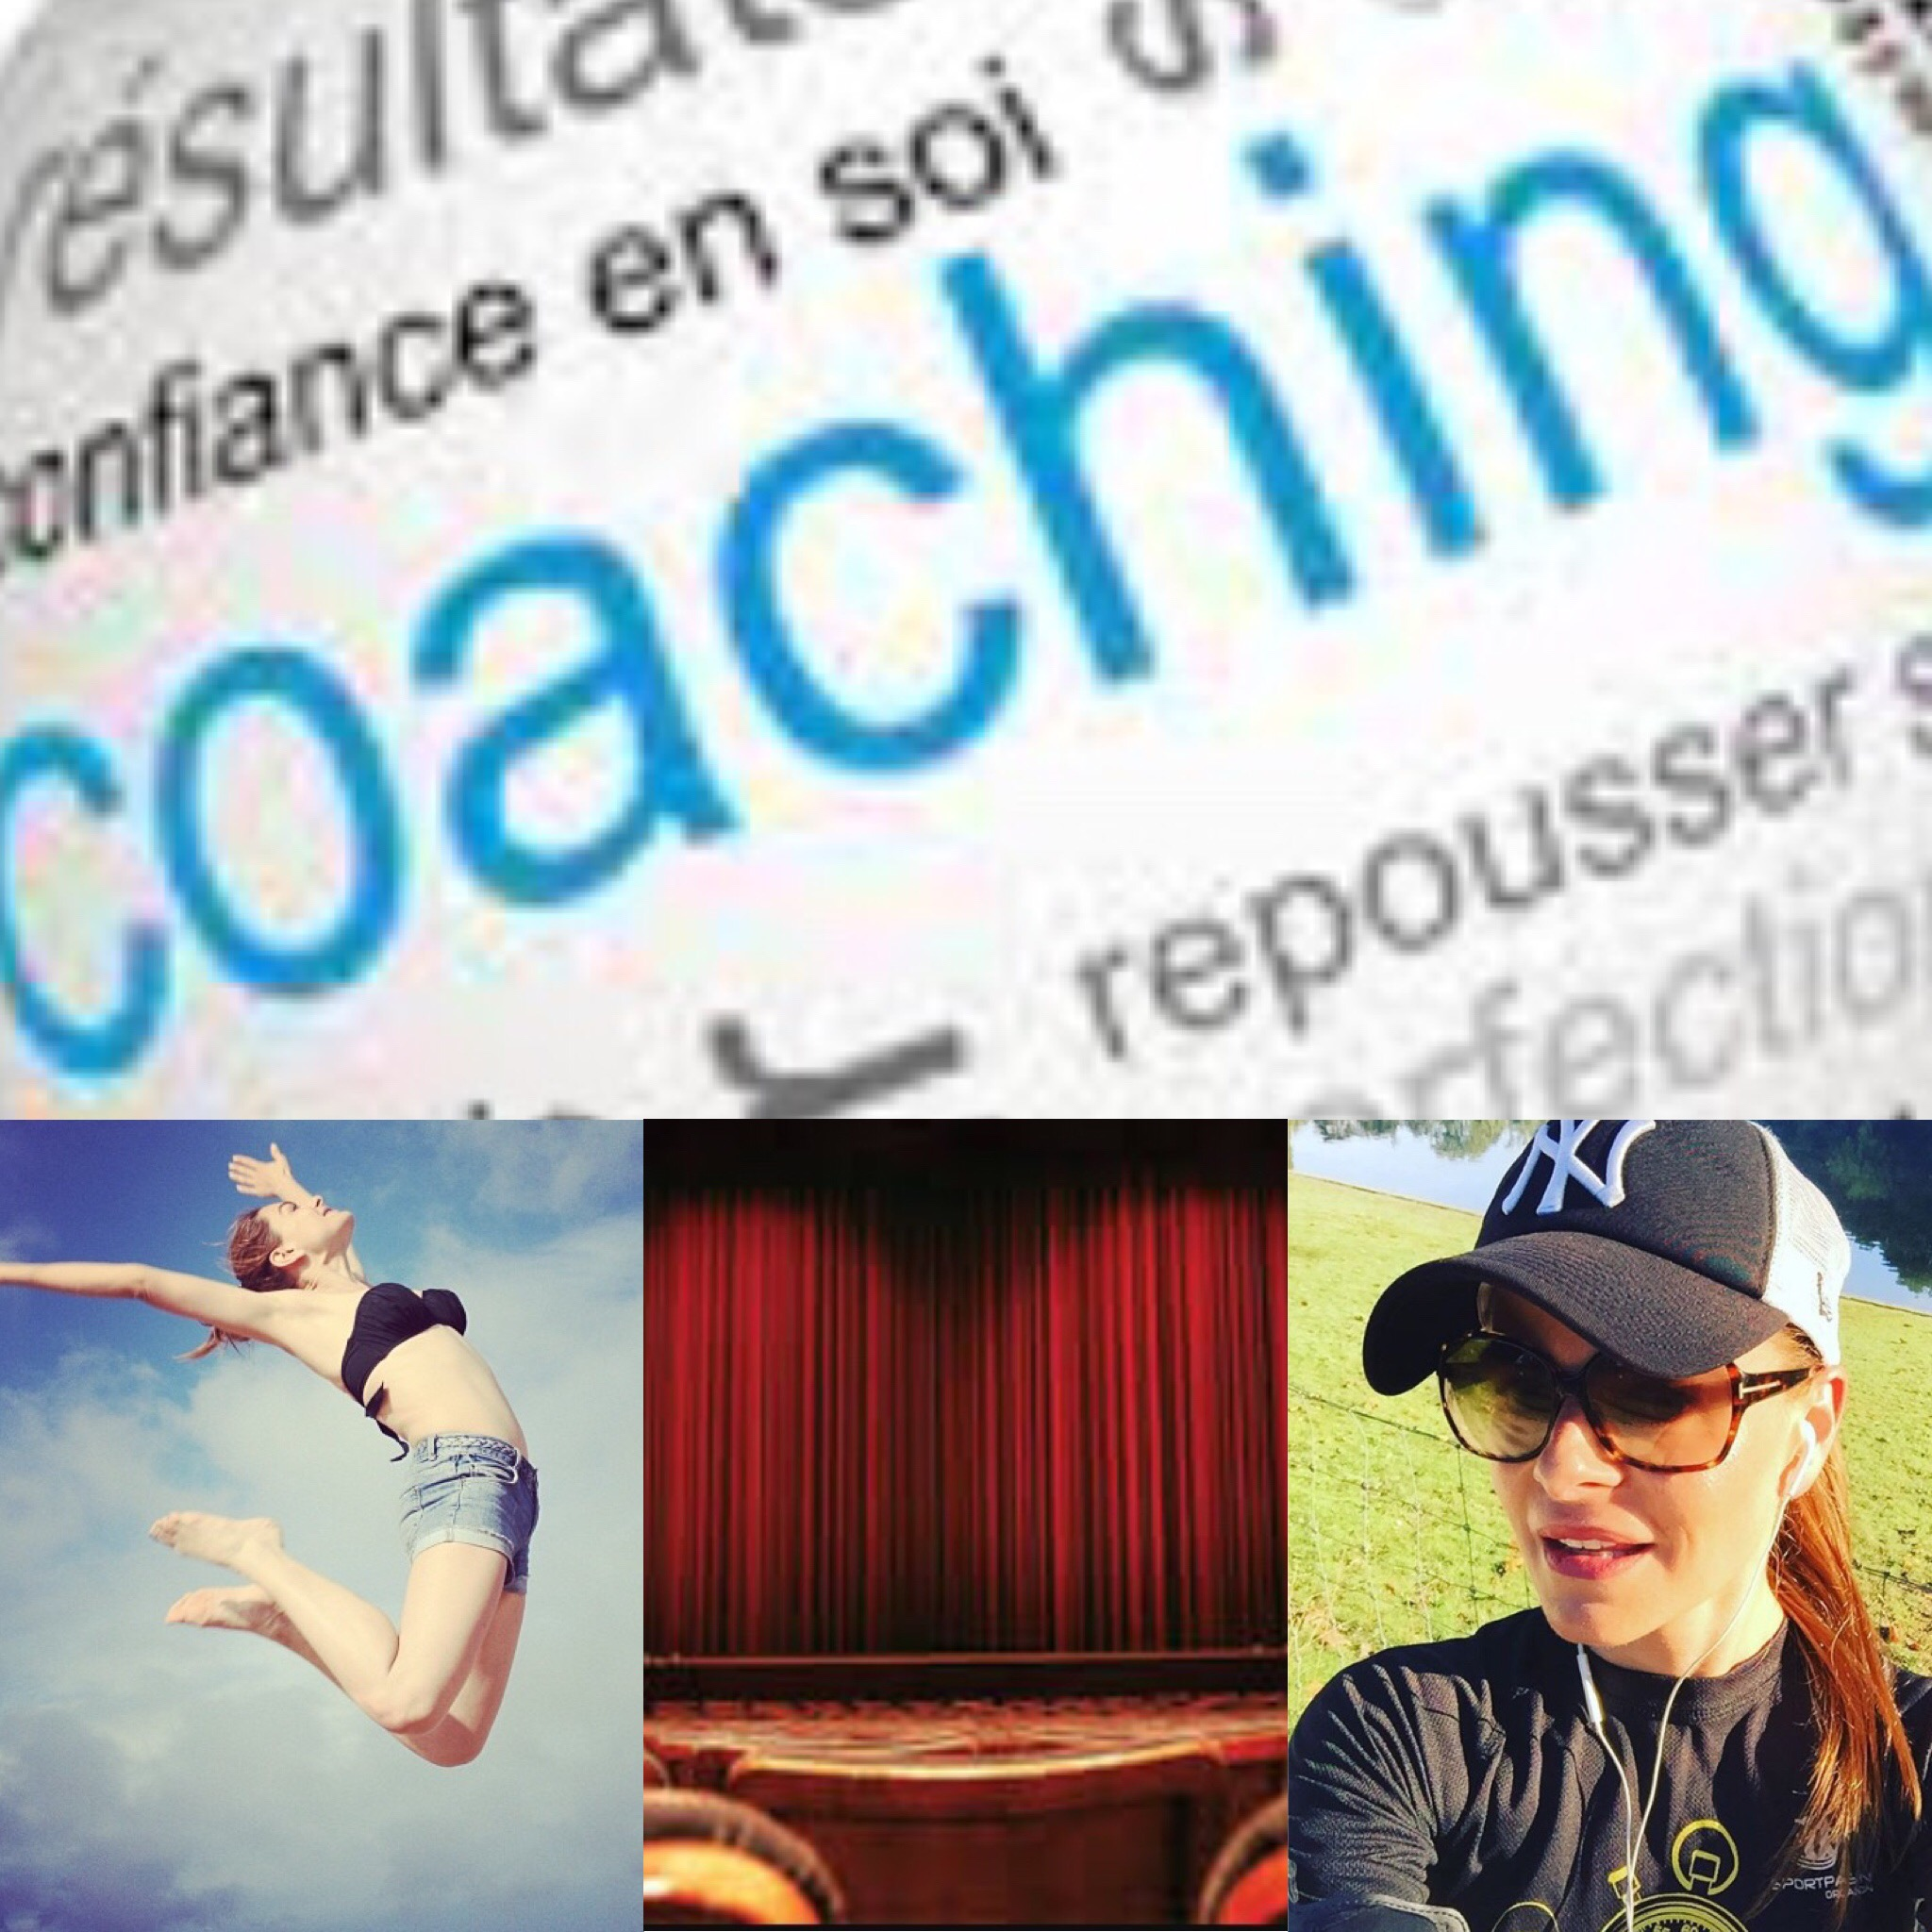 BobCoaching-1509834983.JPG